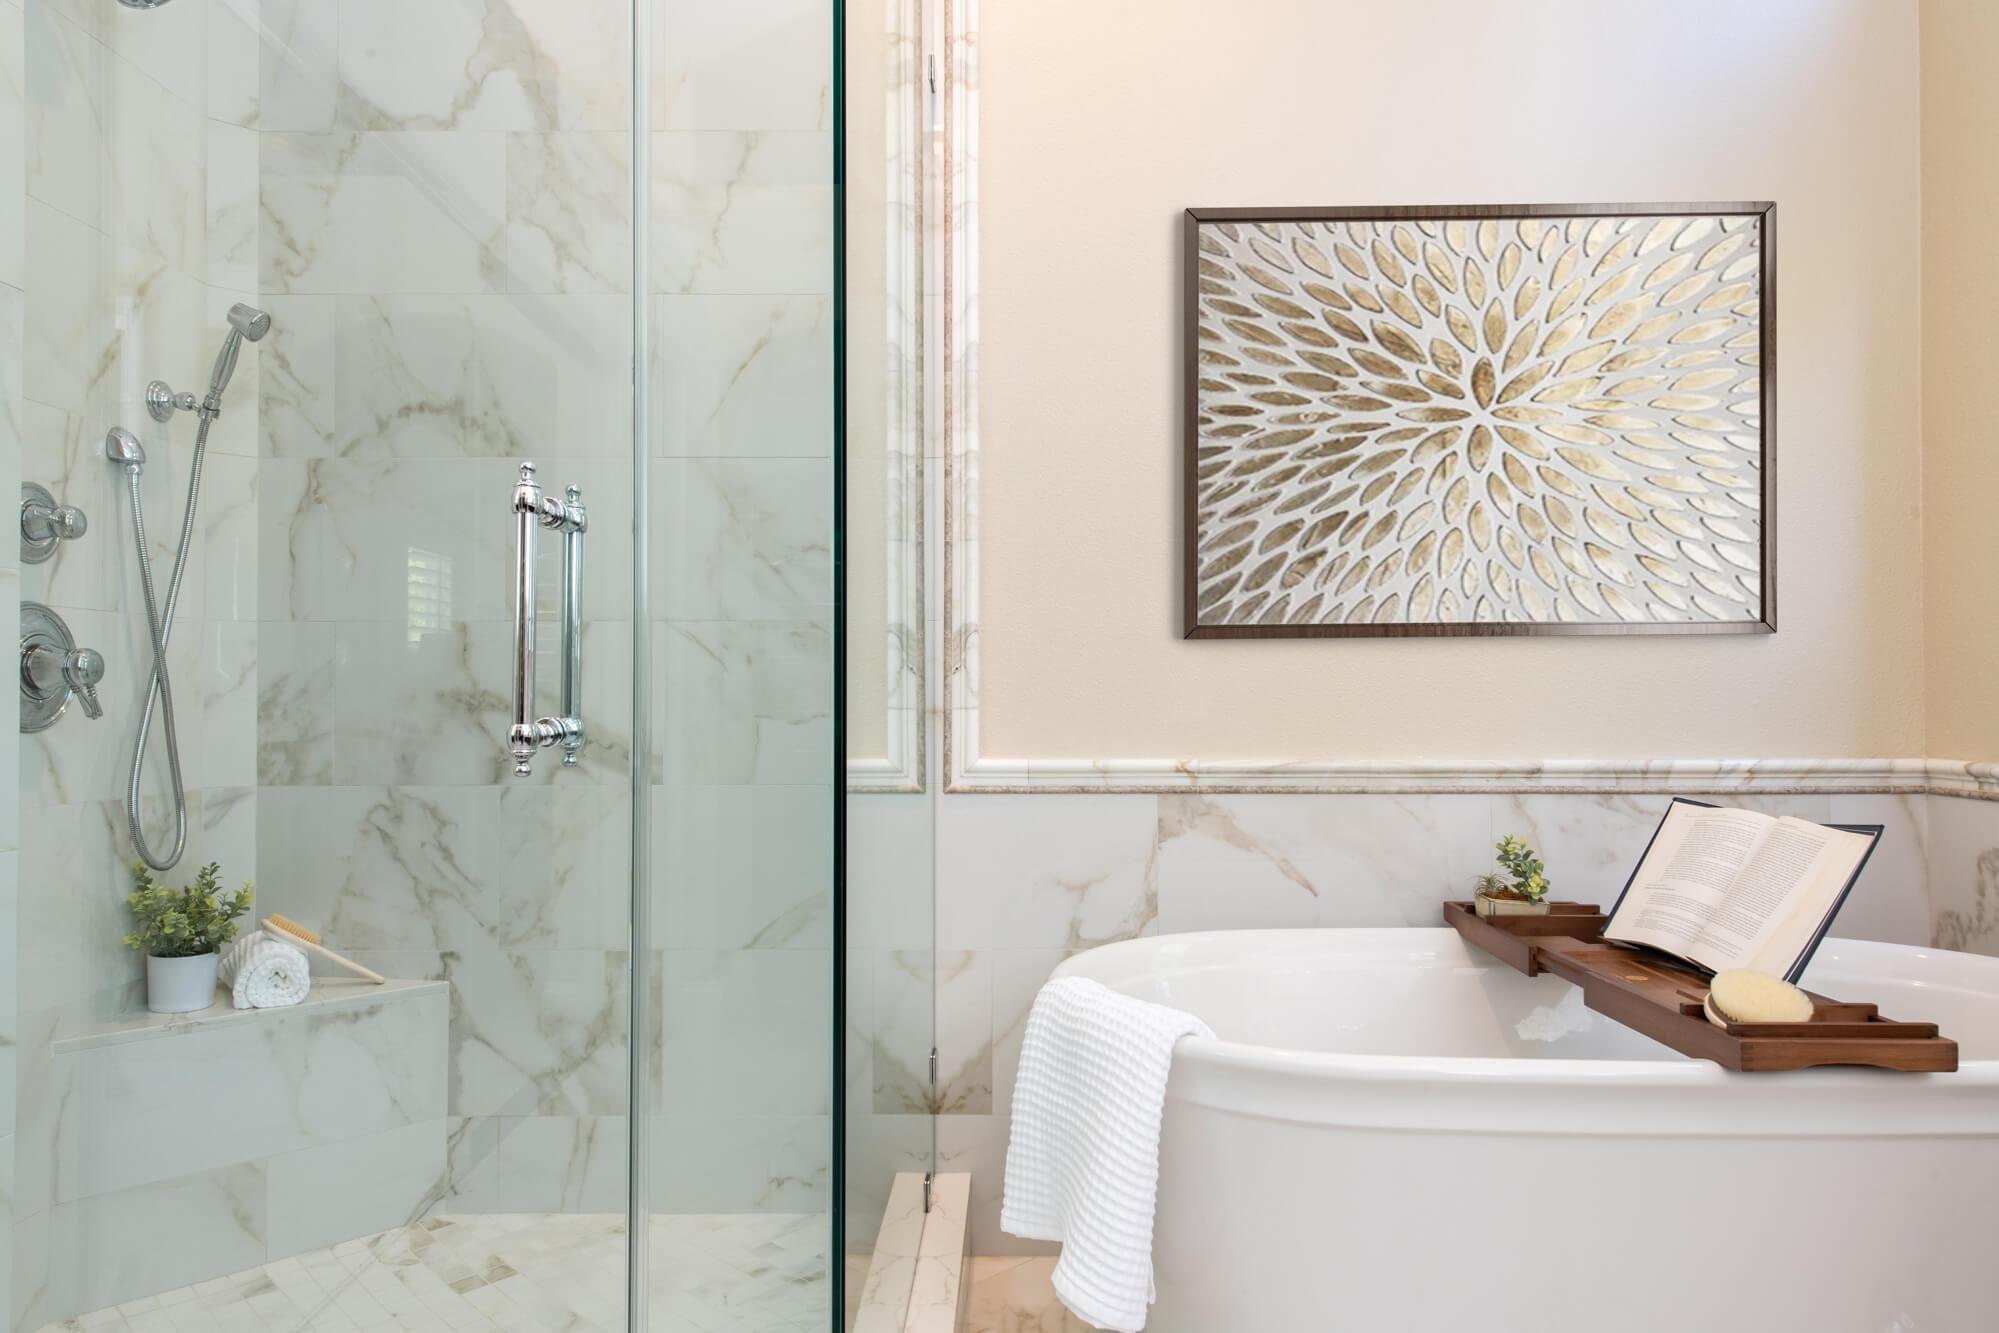 pampering-spa-bath-supplies